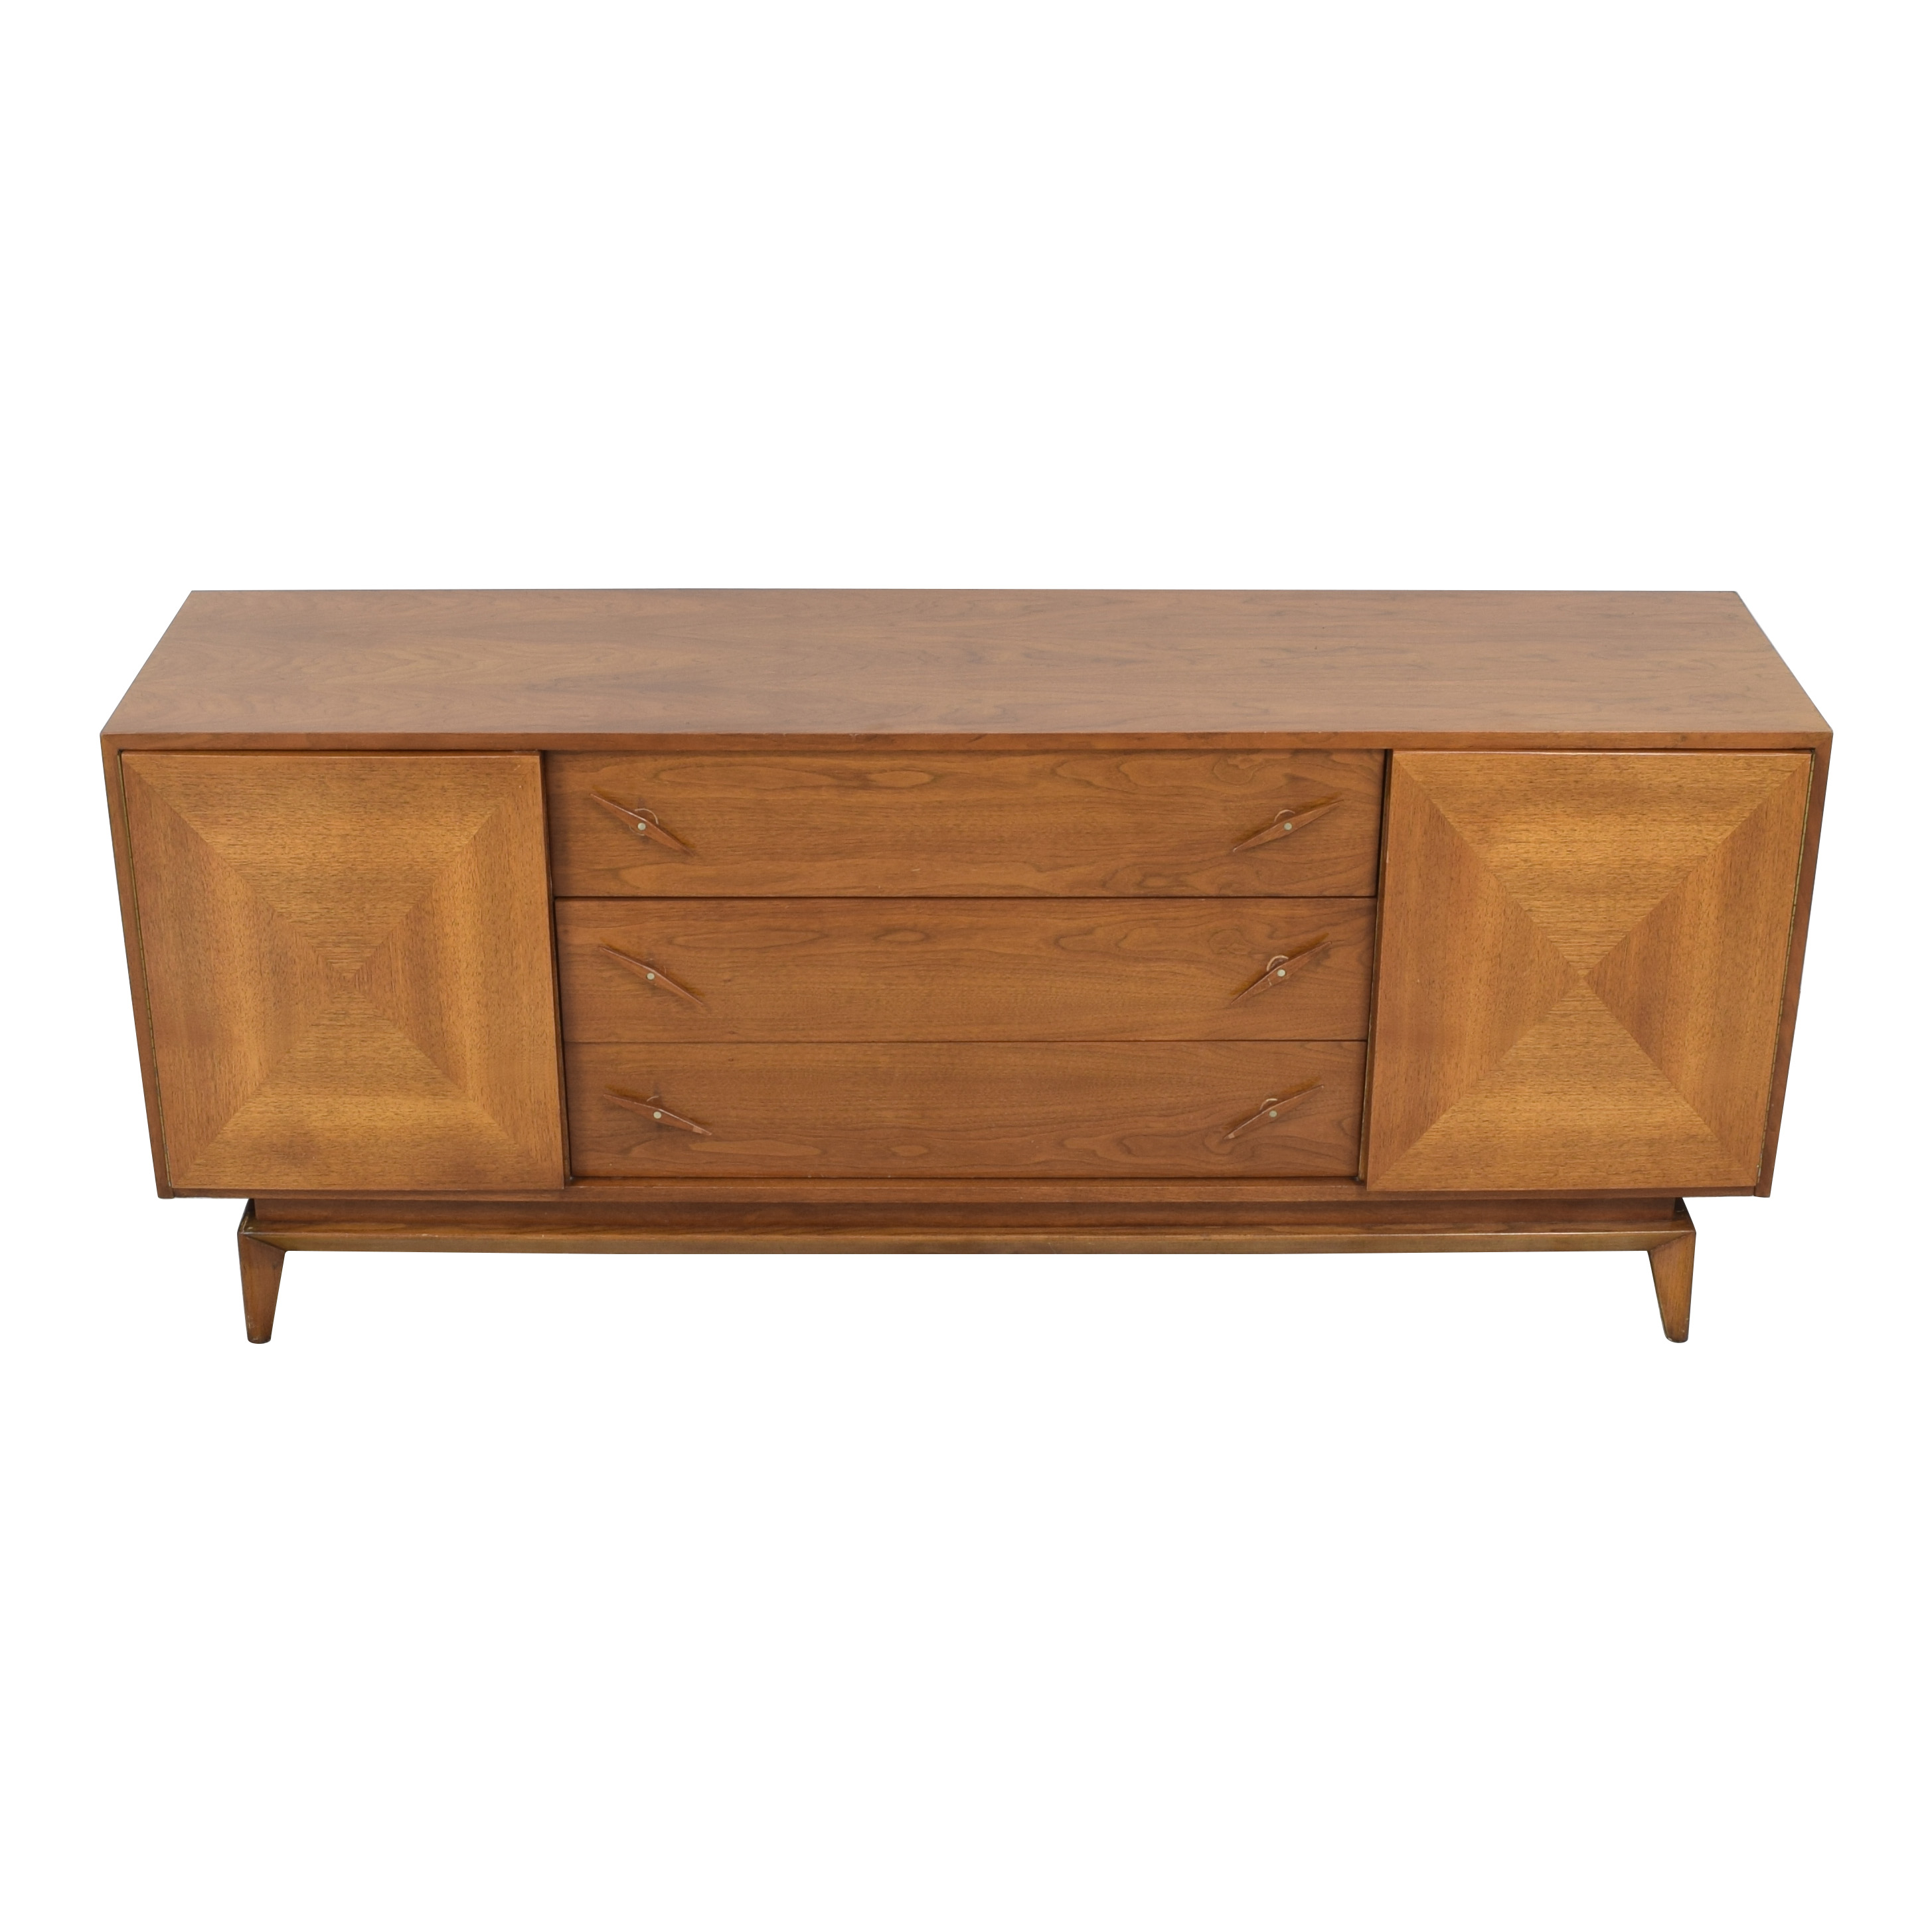 American of Martinsville American of Martinsville Mid Century Credenza Dresser price